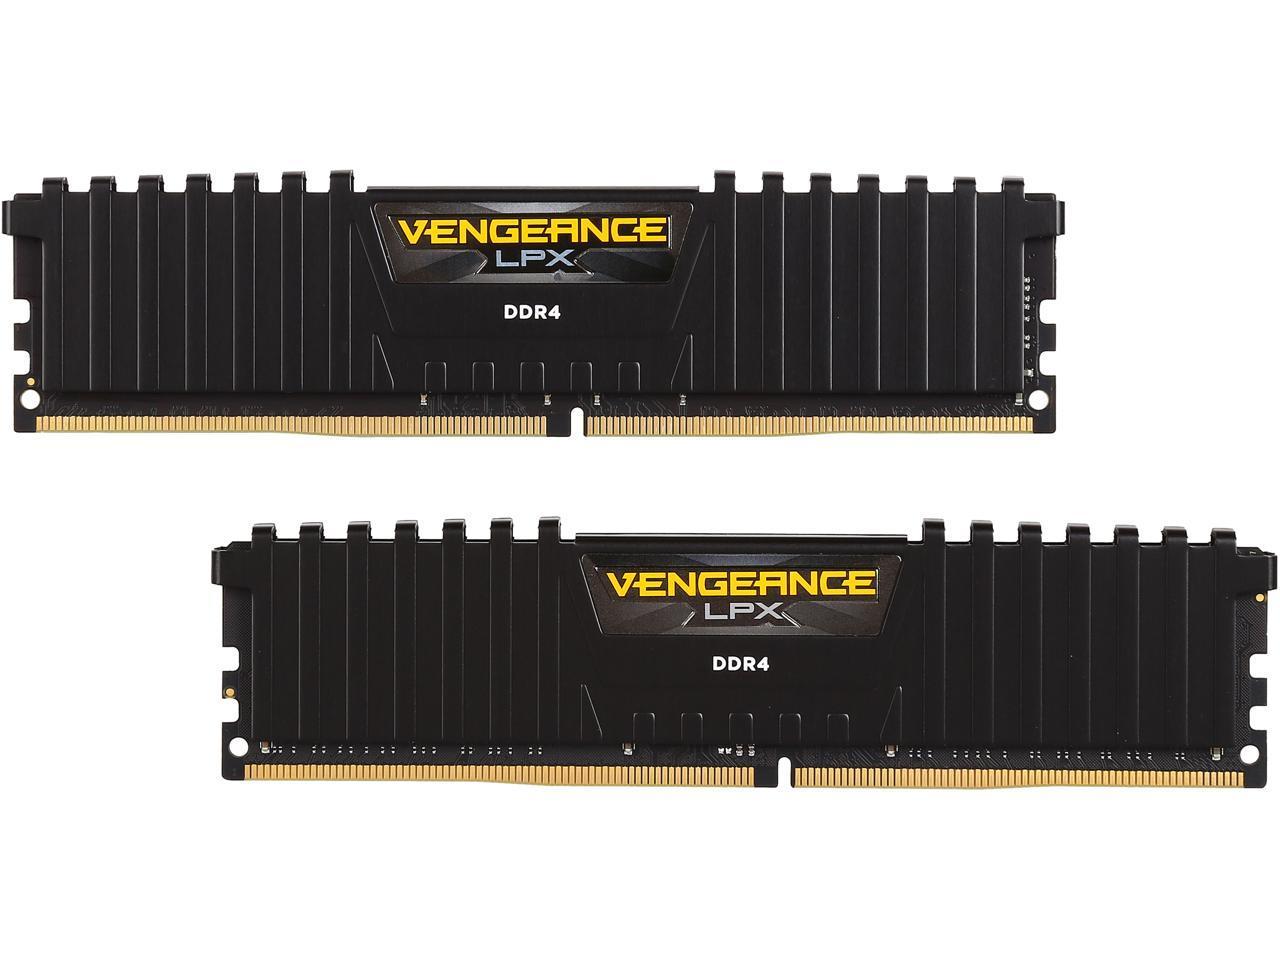 CORSAIR Vengeance LPX 32GB DDR4-2133 (2 x 16GB)